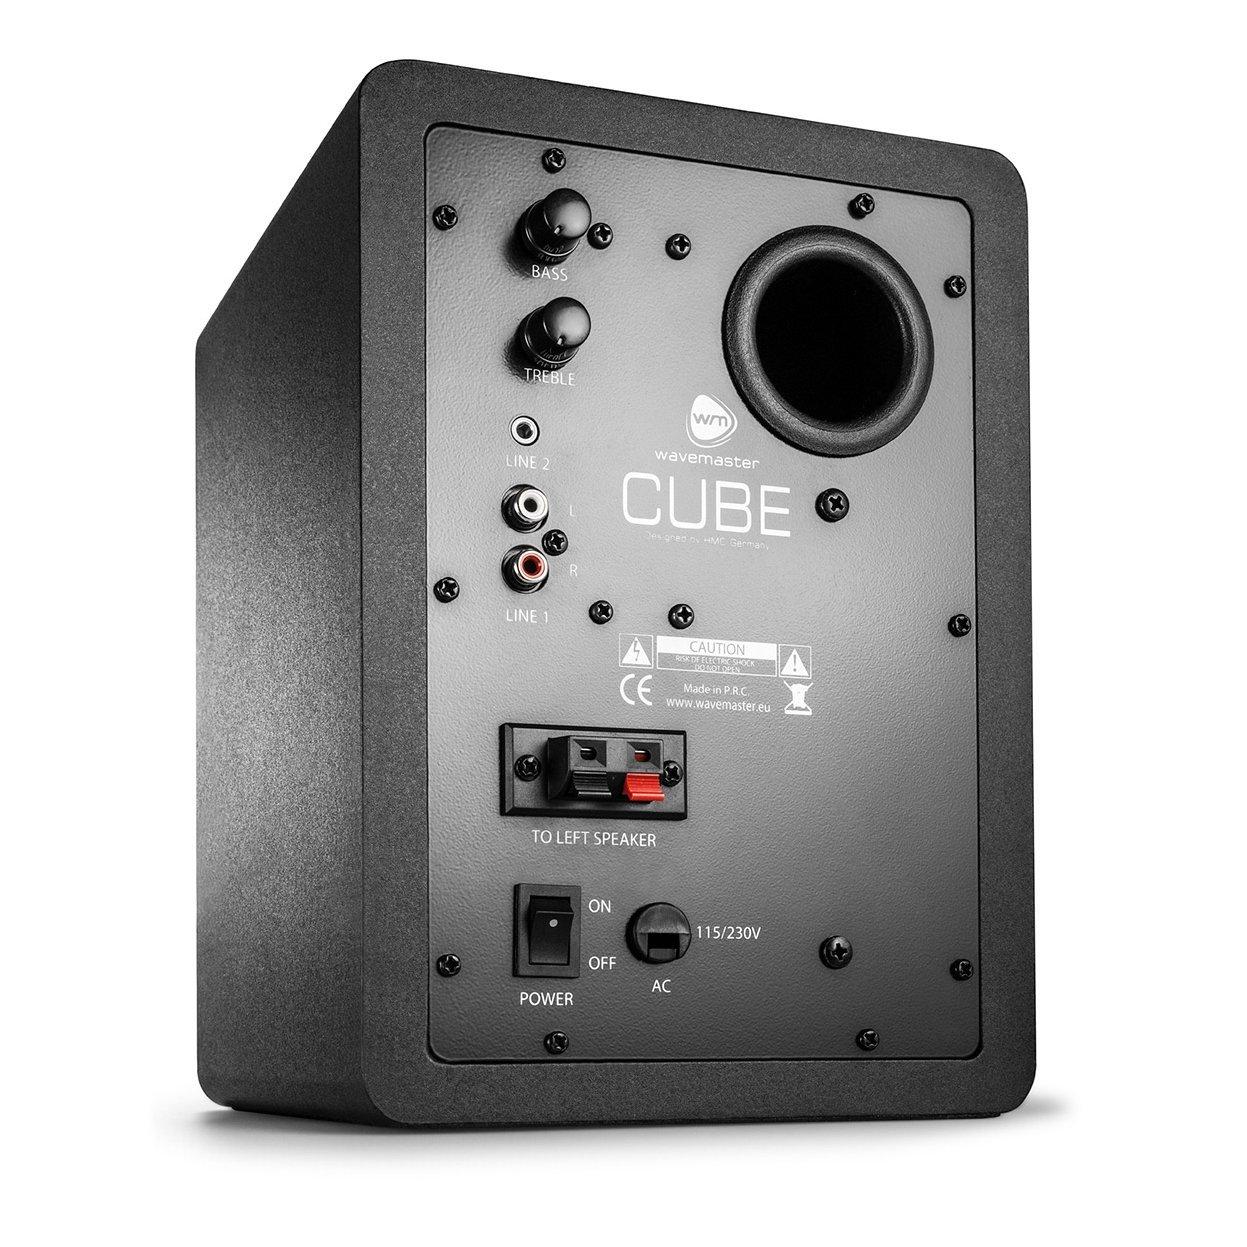 Wavemaster Cube 2 0 Soundsystem Vorgestellt News Technic3d